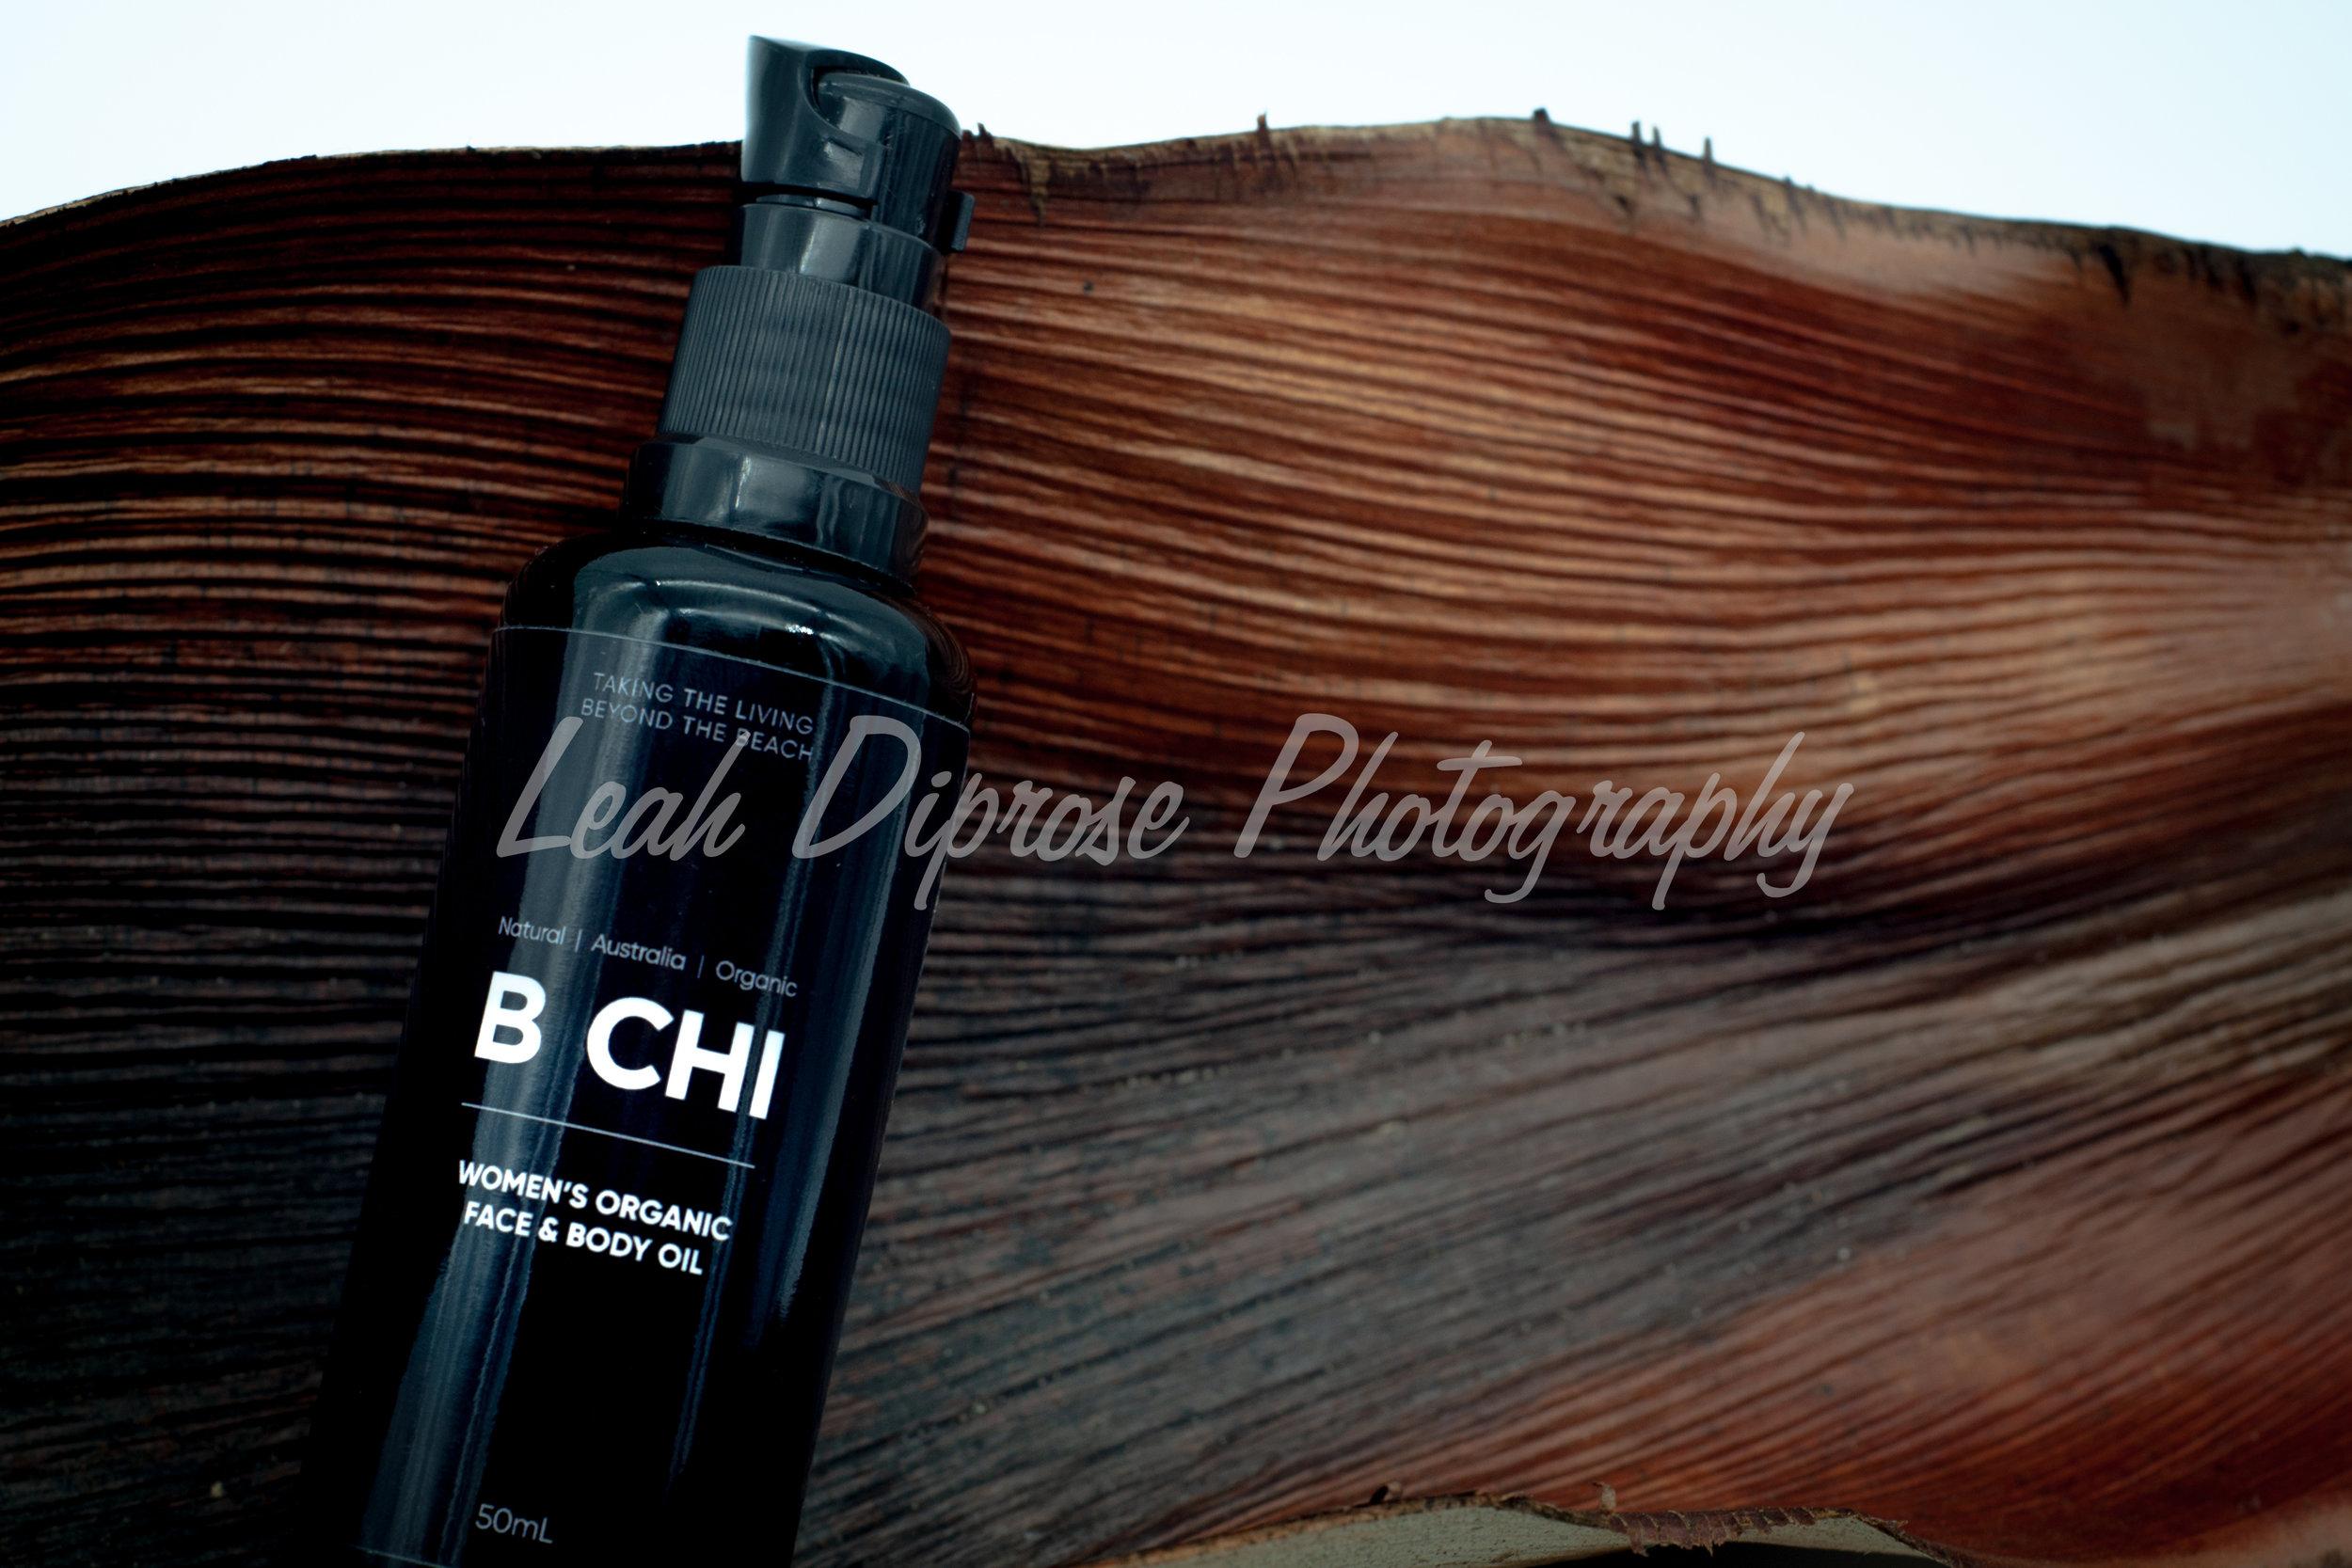 Leah Diprose Photography image-1103.jpg